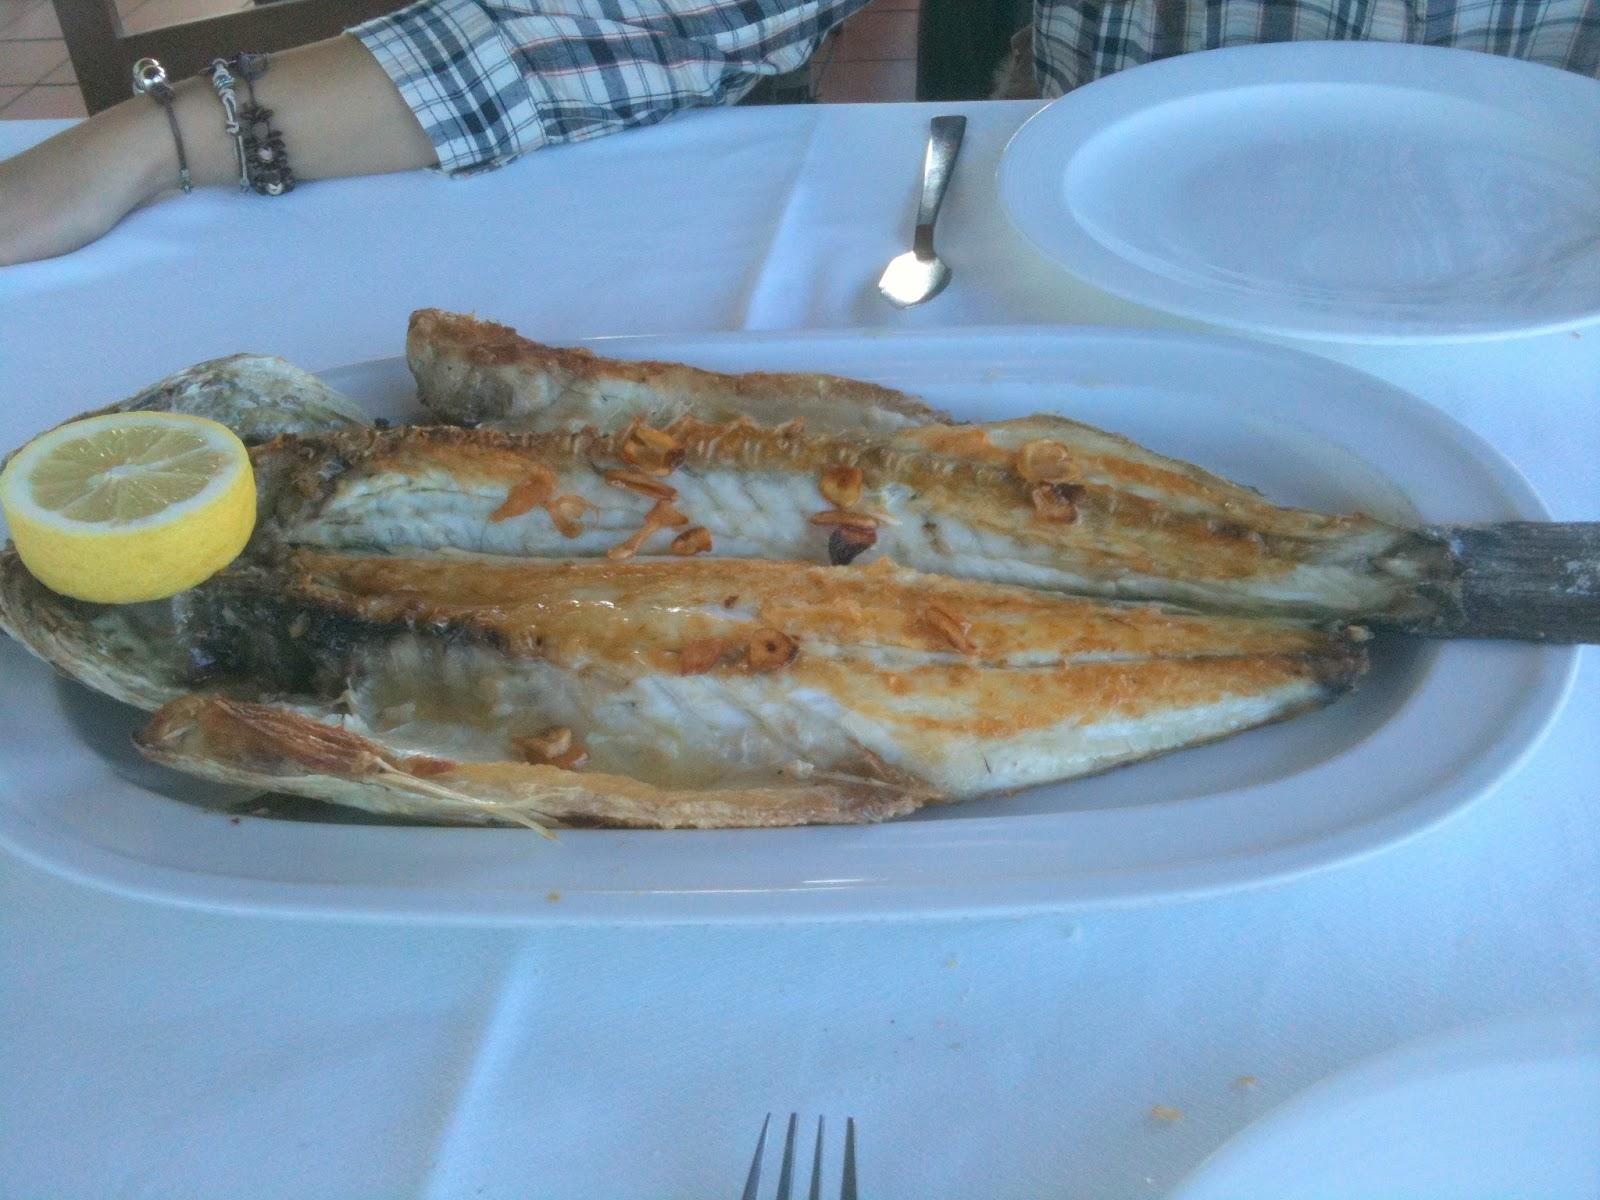 Restaurante la maruca santander share the knownledge - Restaurante la maruca ...